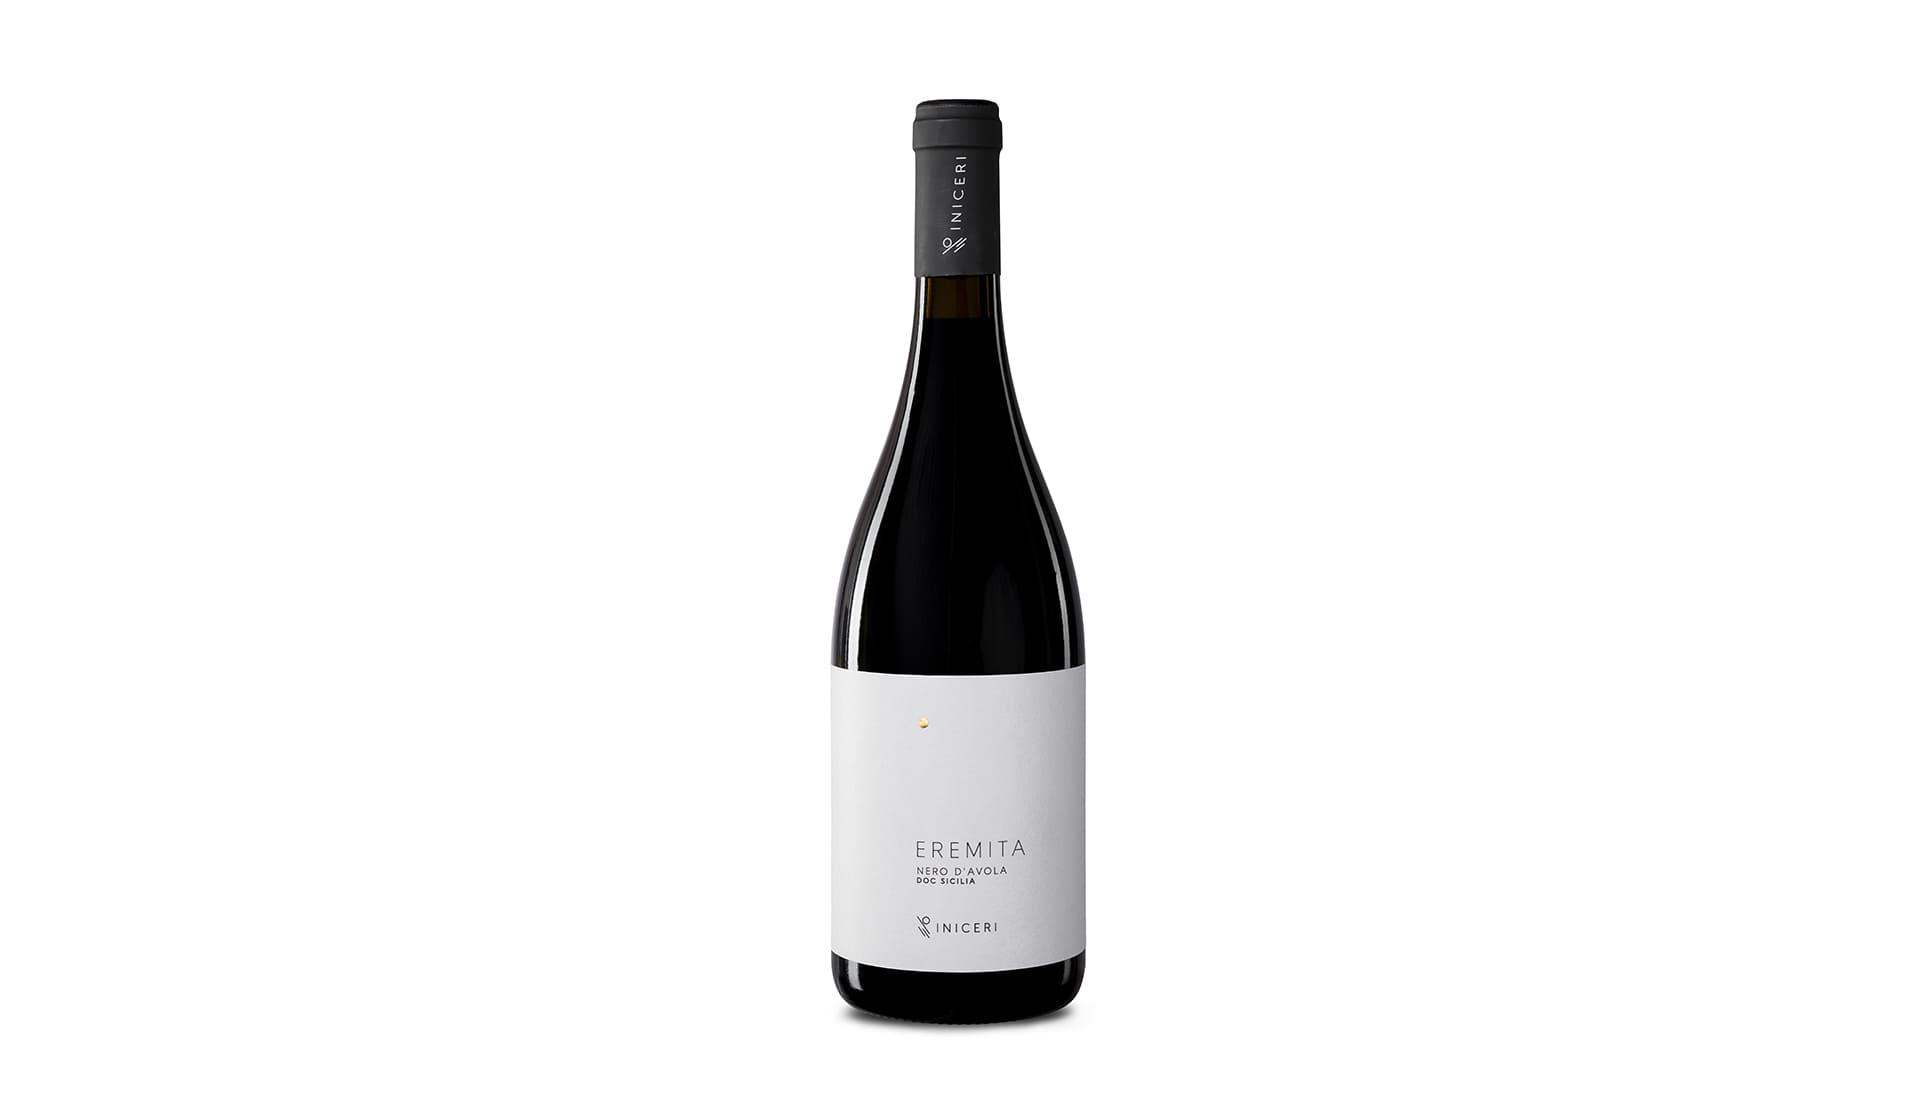 iniceri-eremita-etichetta-vino